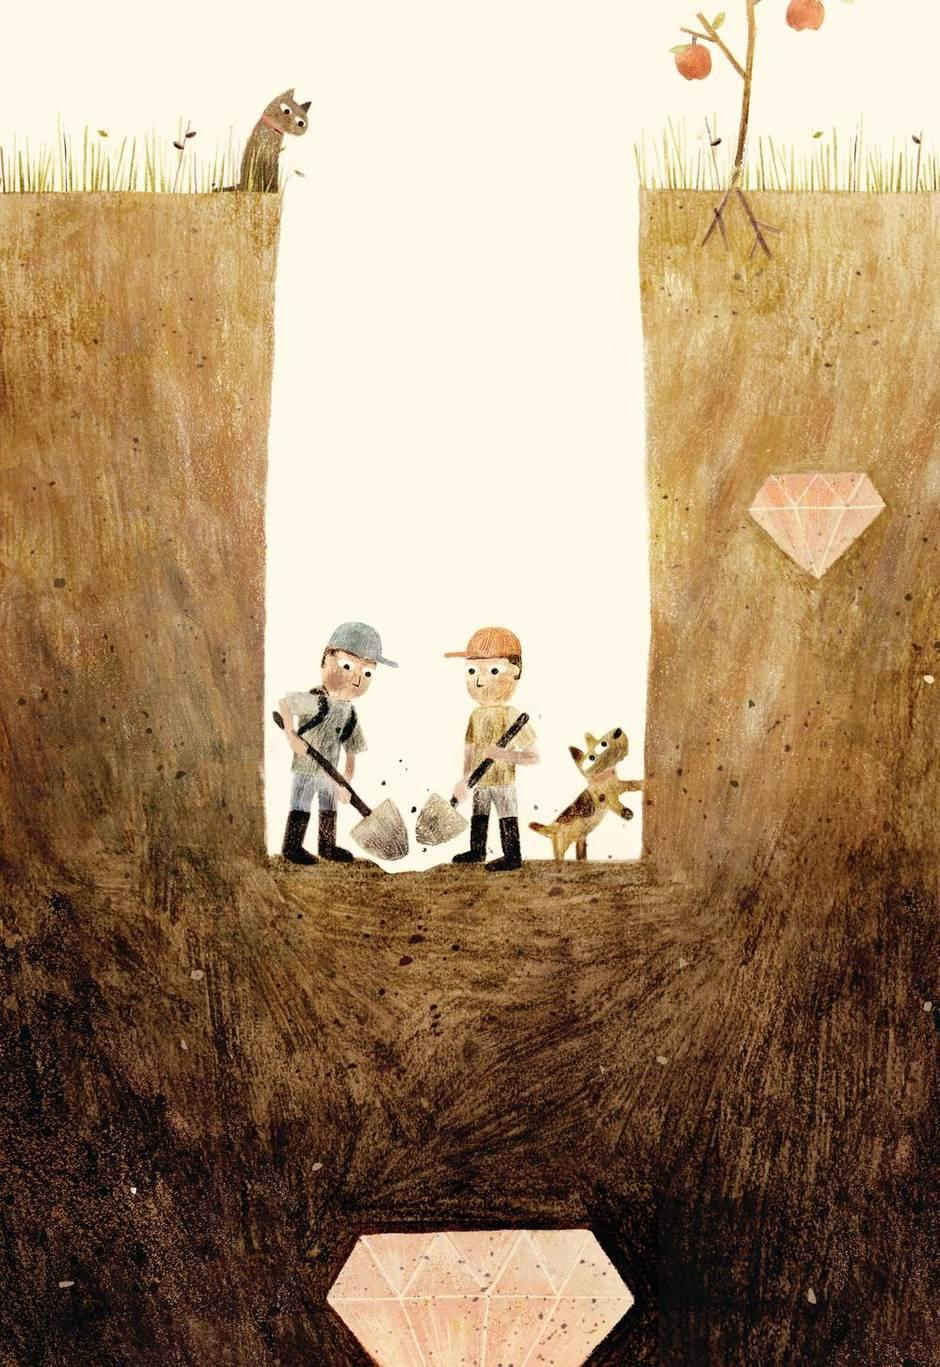 Sam and Dave Dig a Hole. Illustrator: Jon Klassen. Author: Mac Barnett